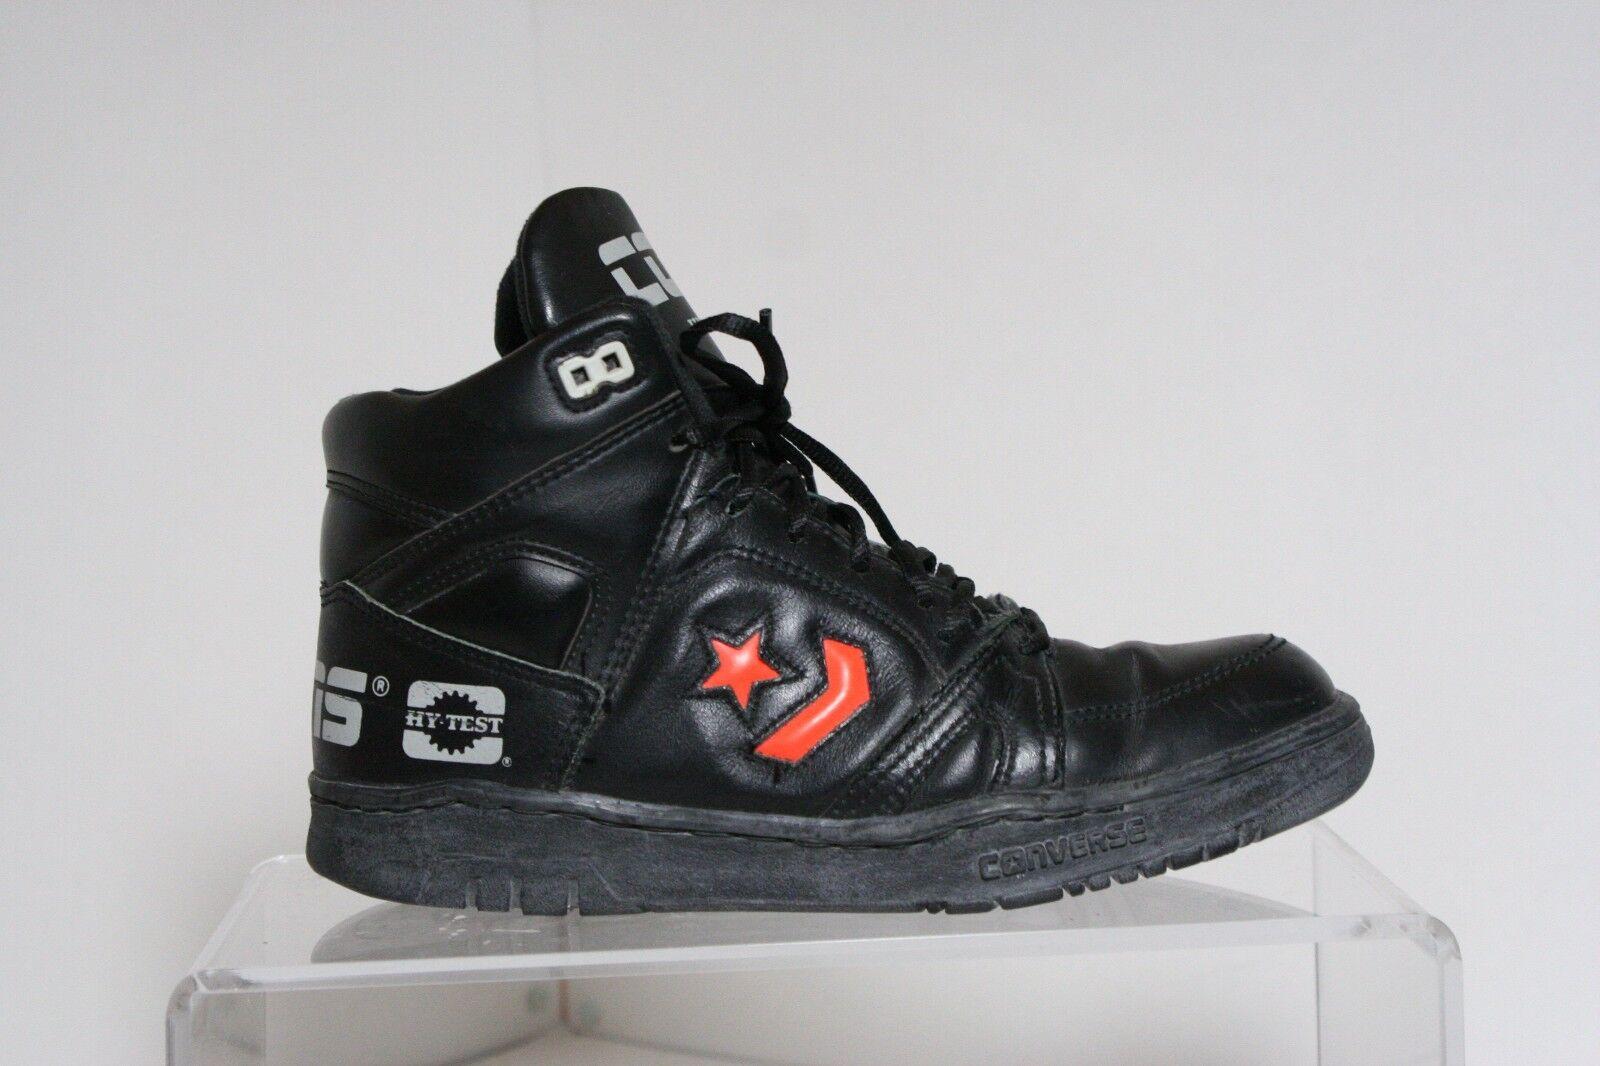 Converse Cons Vintage Hy-Test Steel Toe Sneakers Multi Hipster Men's 6 Orange